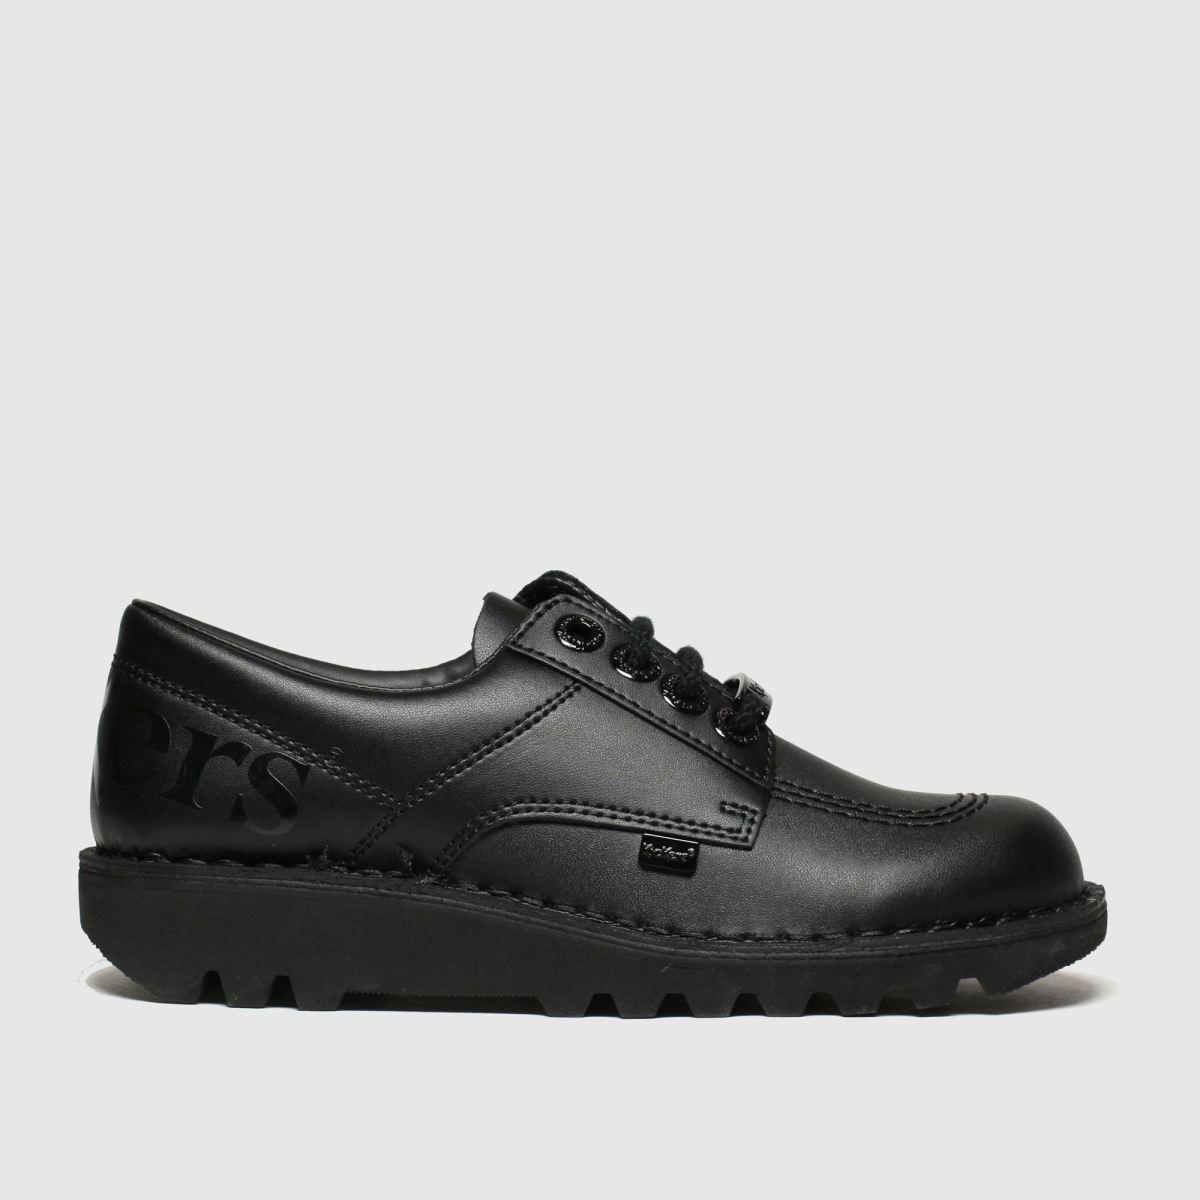 Kickers Black Kick Lo Luxx Shoes Youth